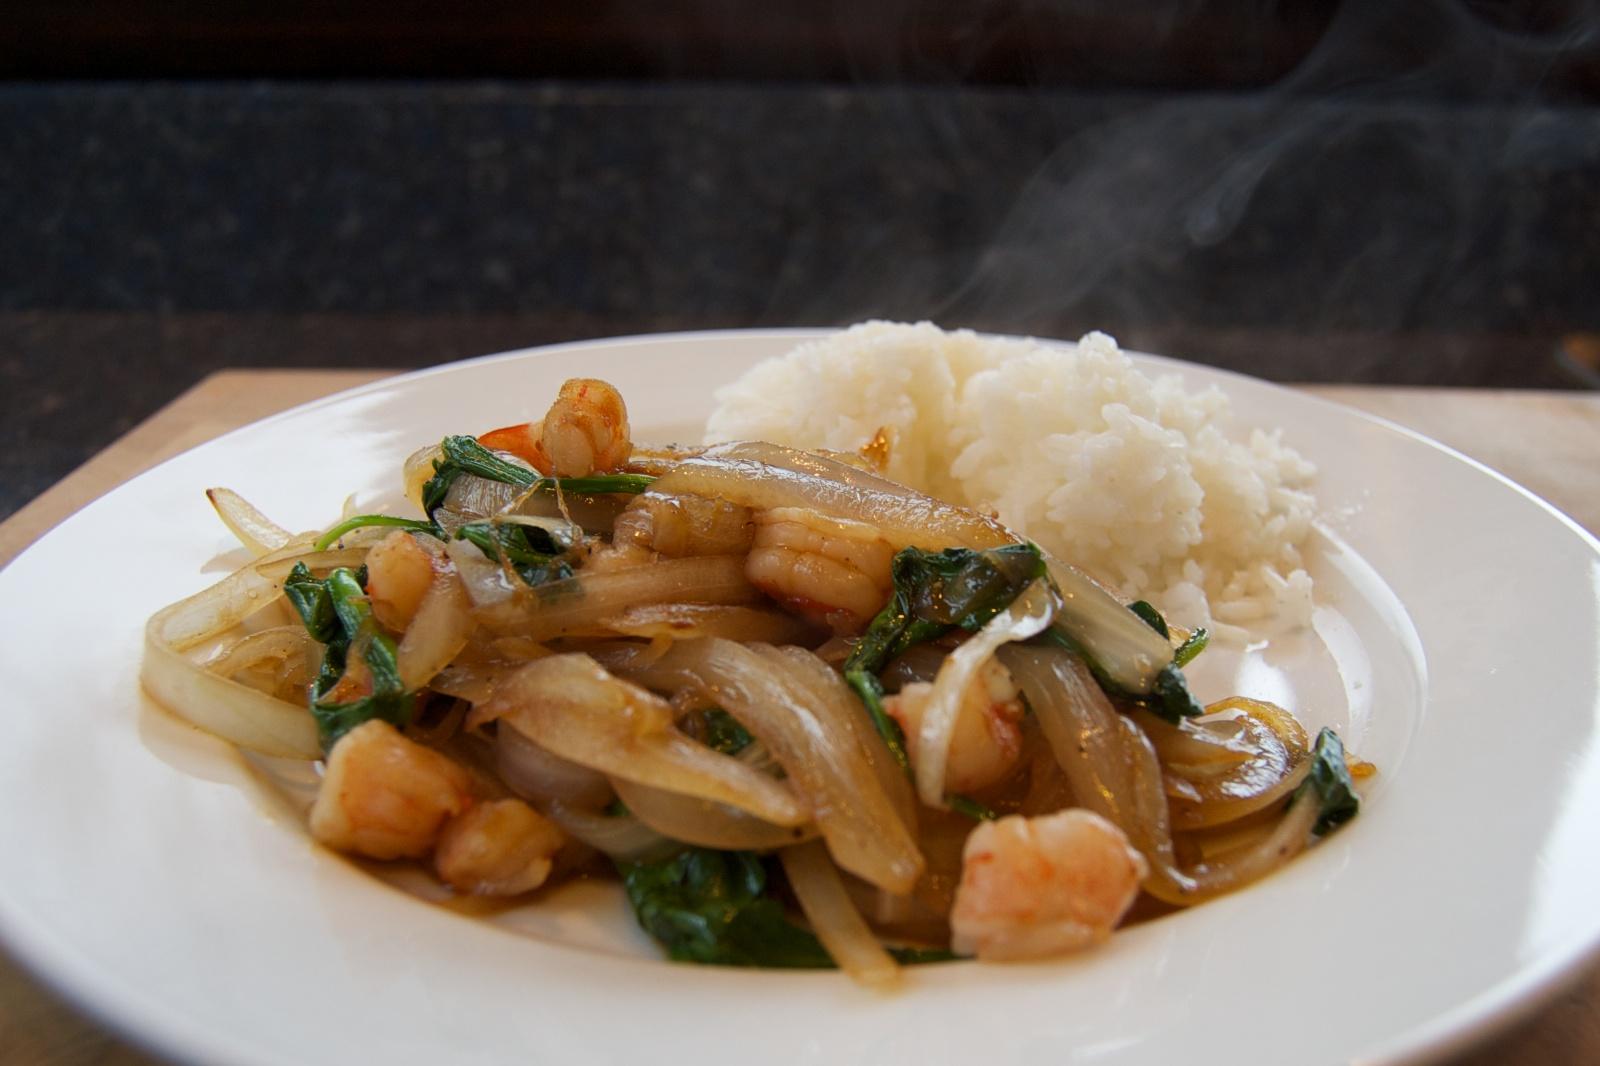 http://blog.rickk.com/food/2012/12/17/ate.2012.12.17.l.jpg